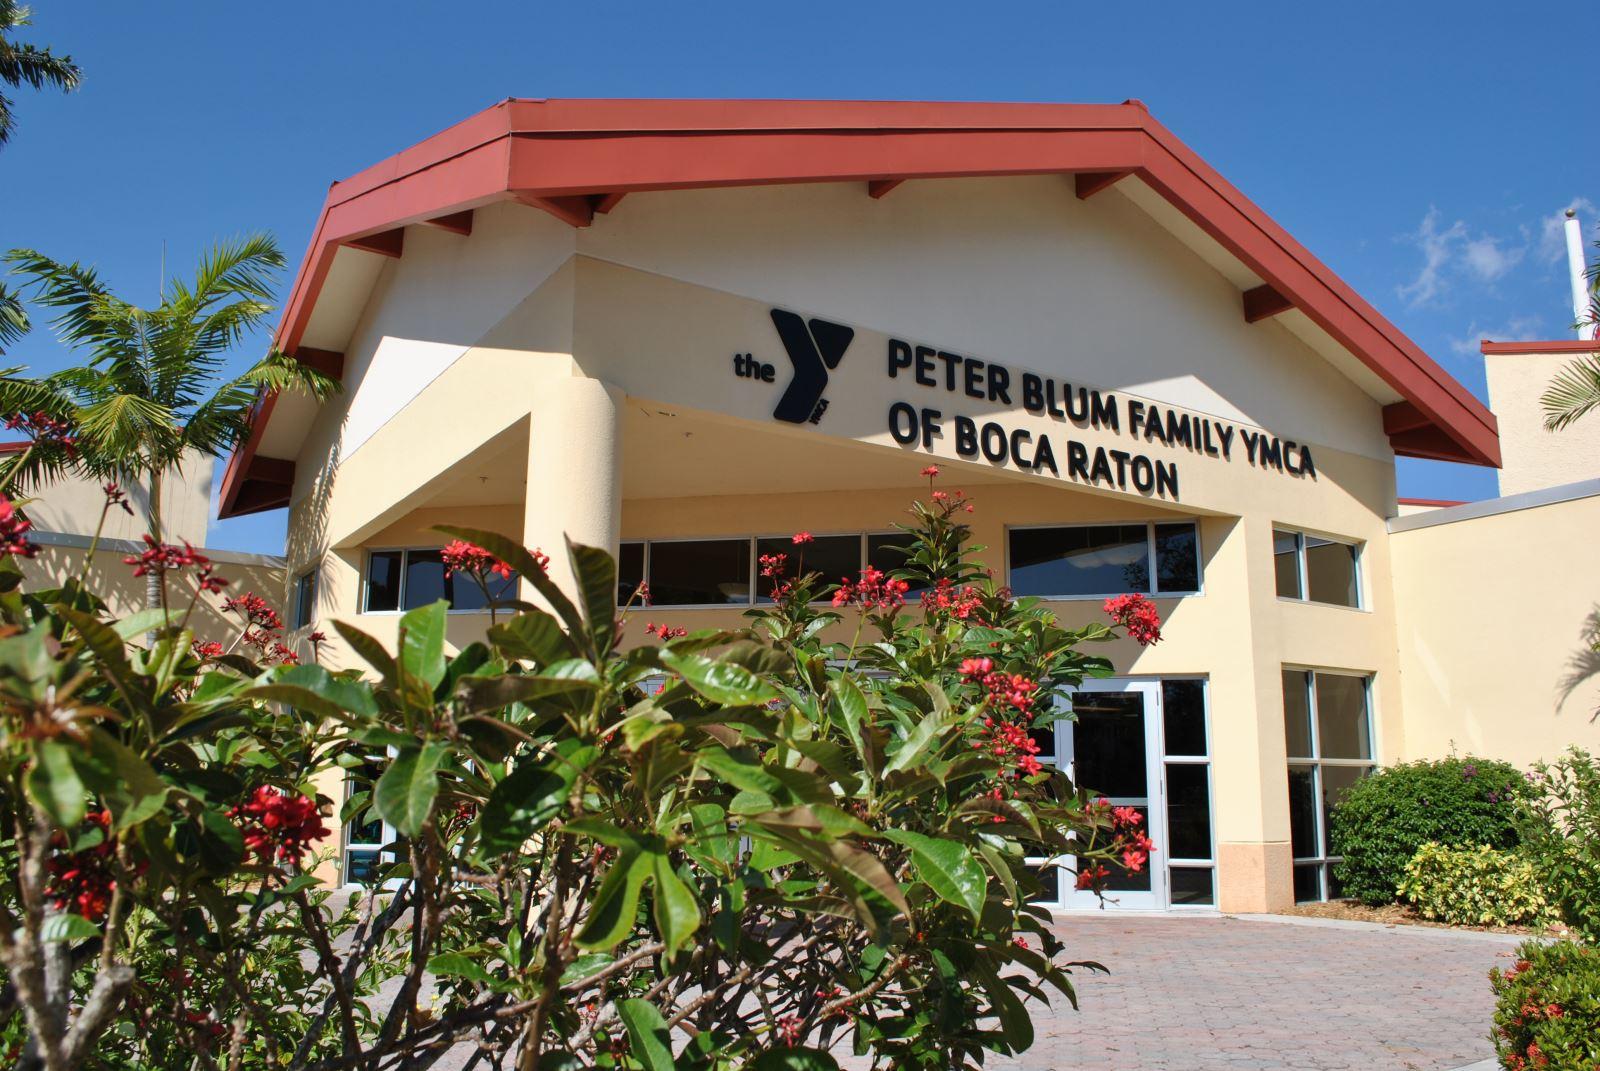 YMCA of Boca Raton Peter Blum Family Center